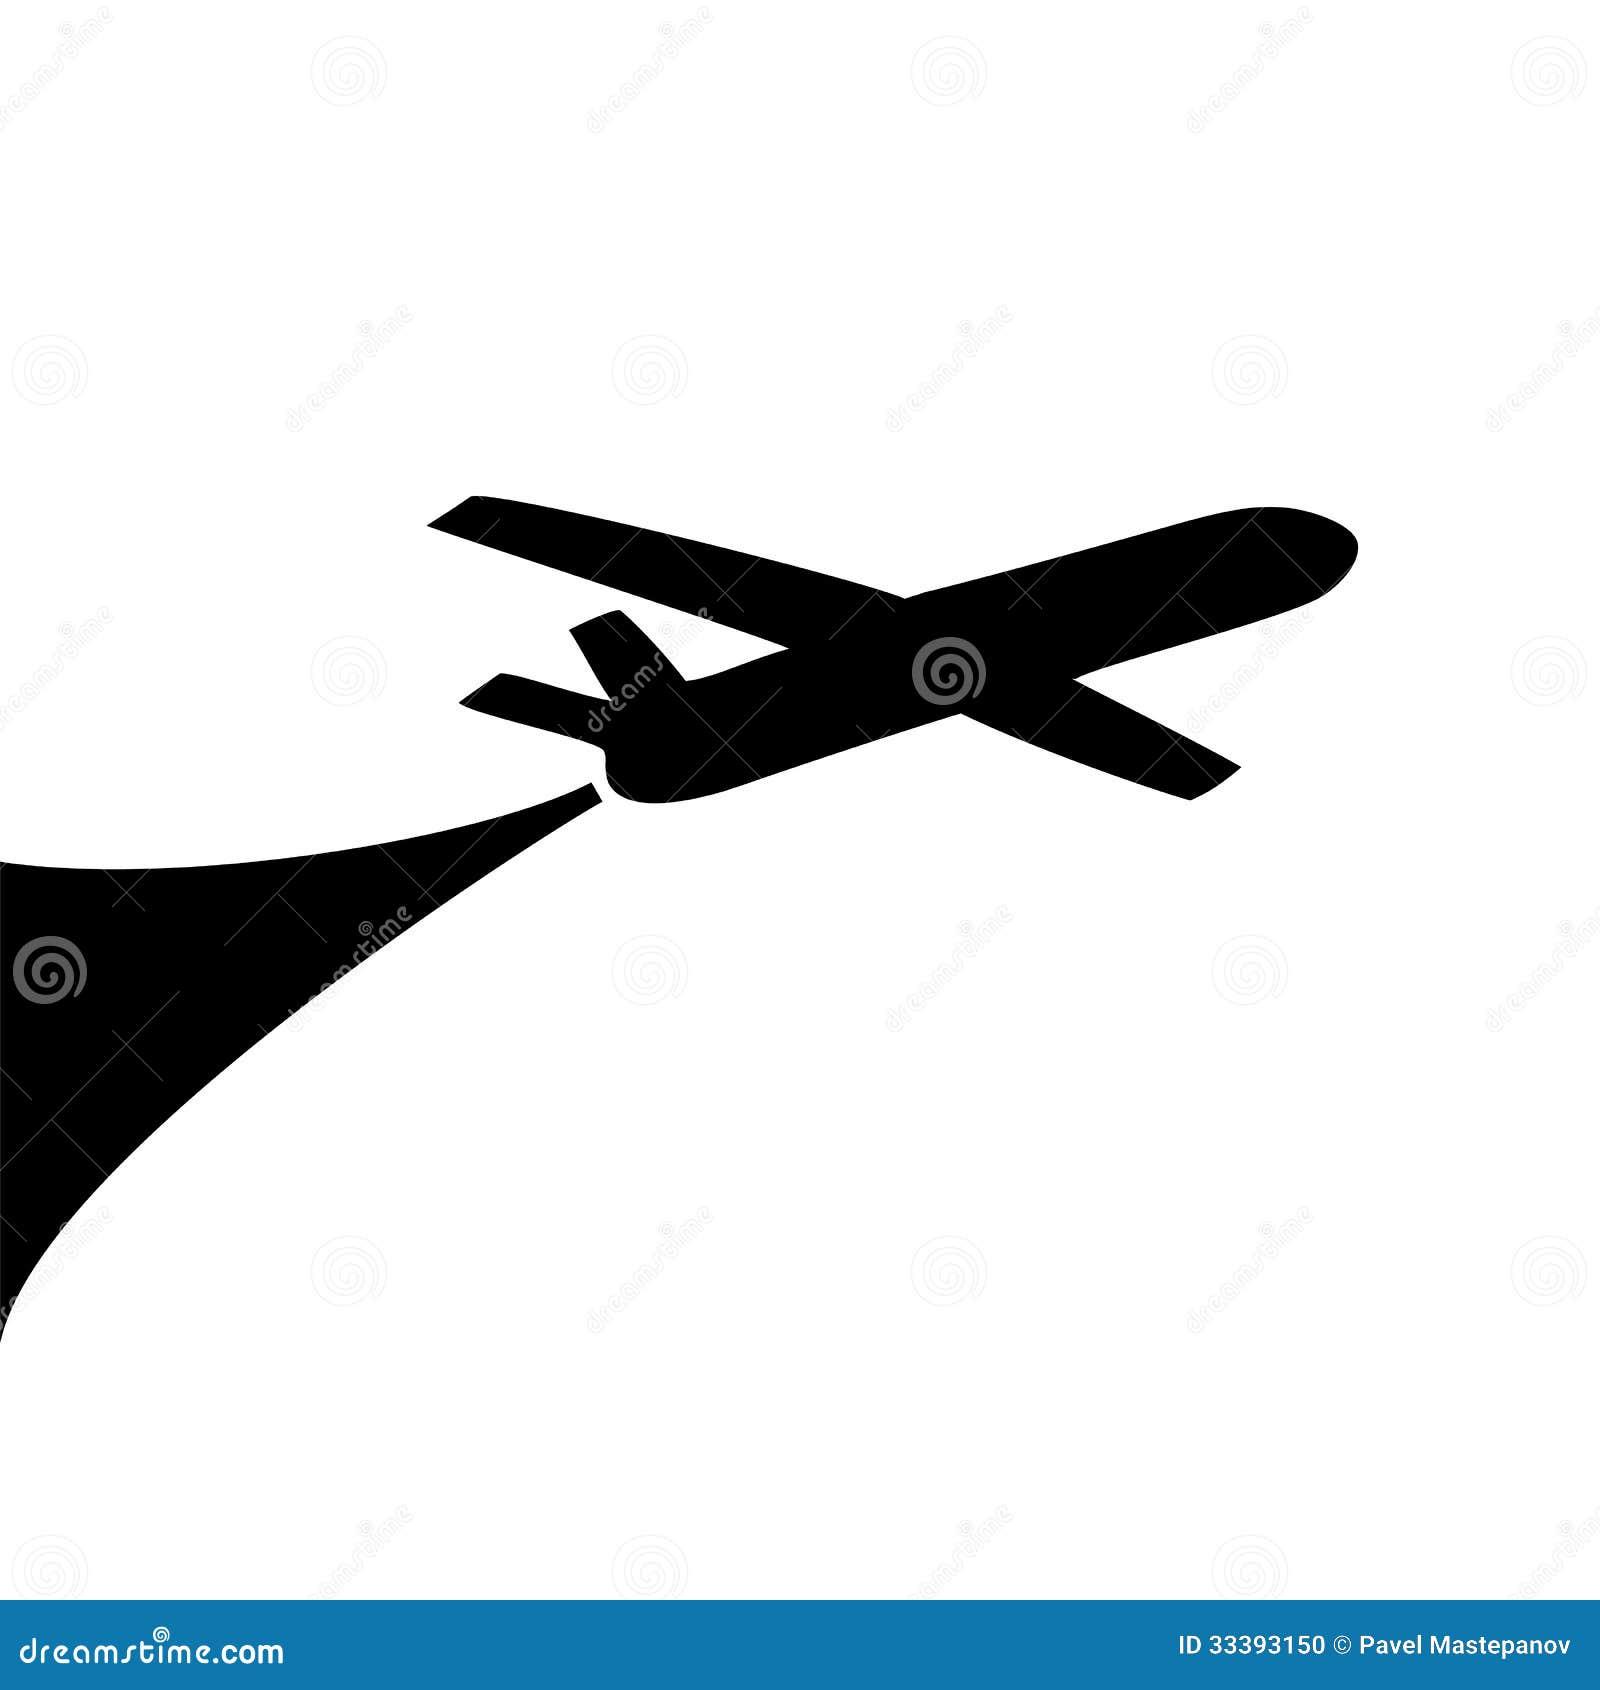 Airplane symbol design stock vector illustration of airplane airplane symbol design buycottarizona Gallery